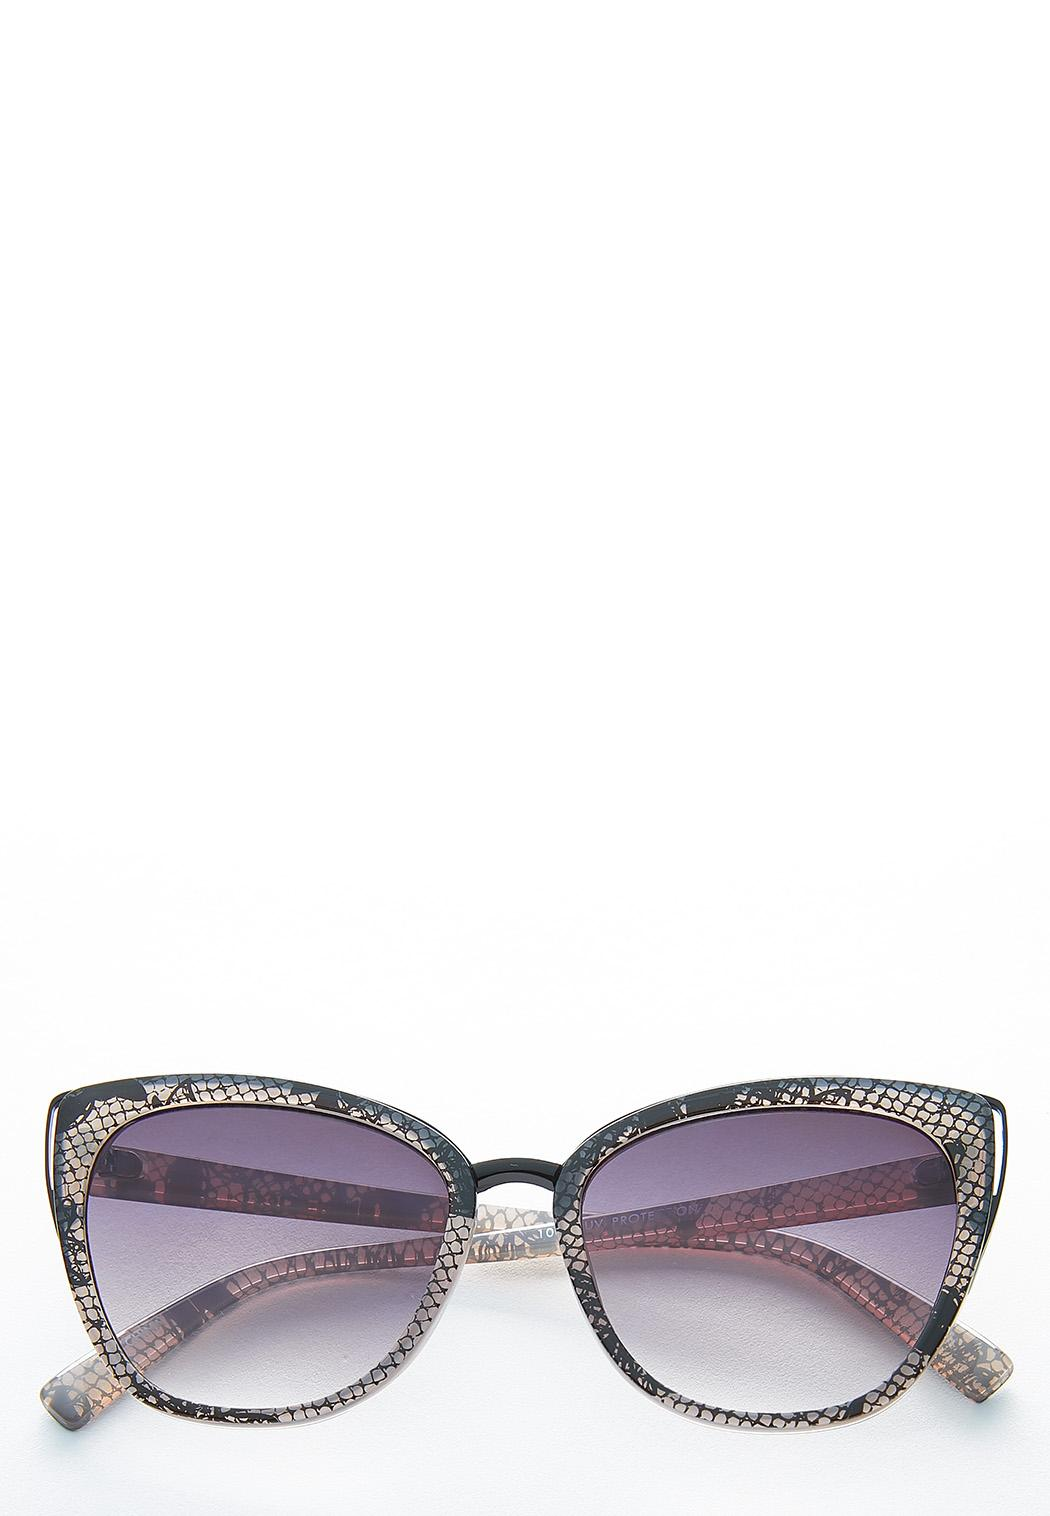 Snakeskin Cateye Sunglasses